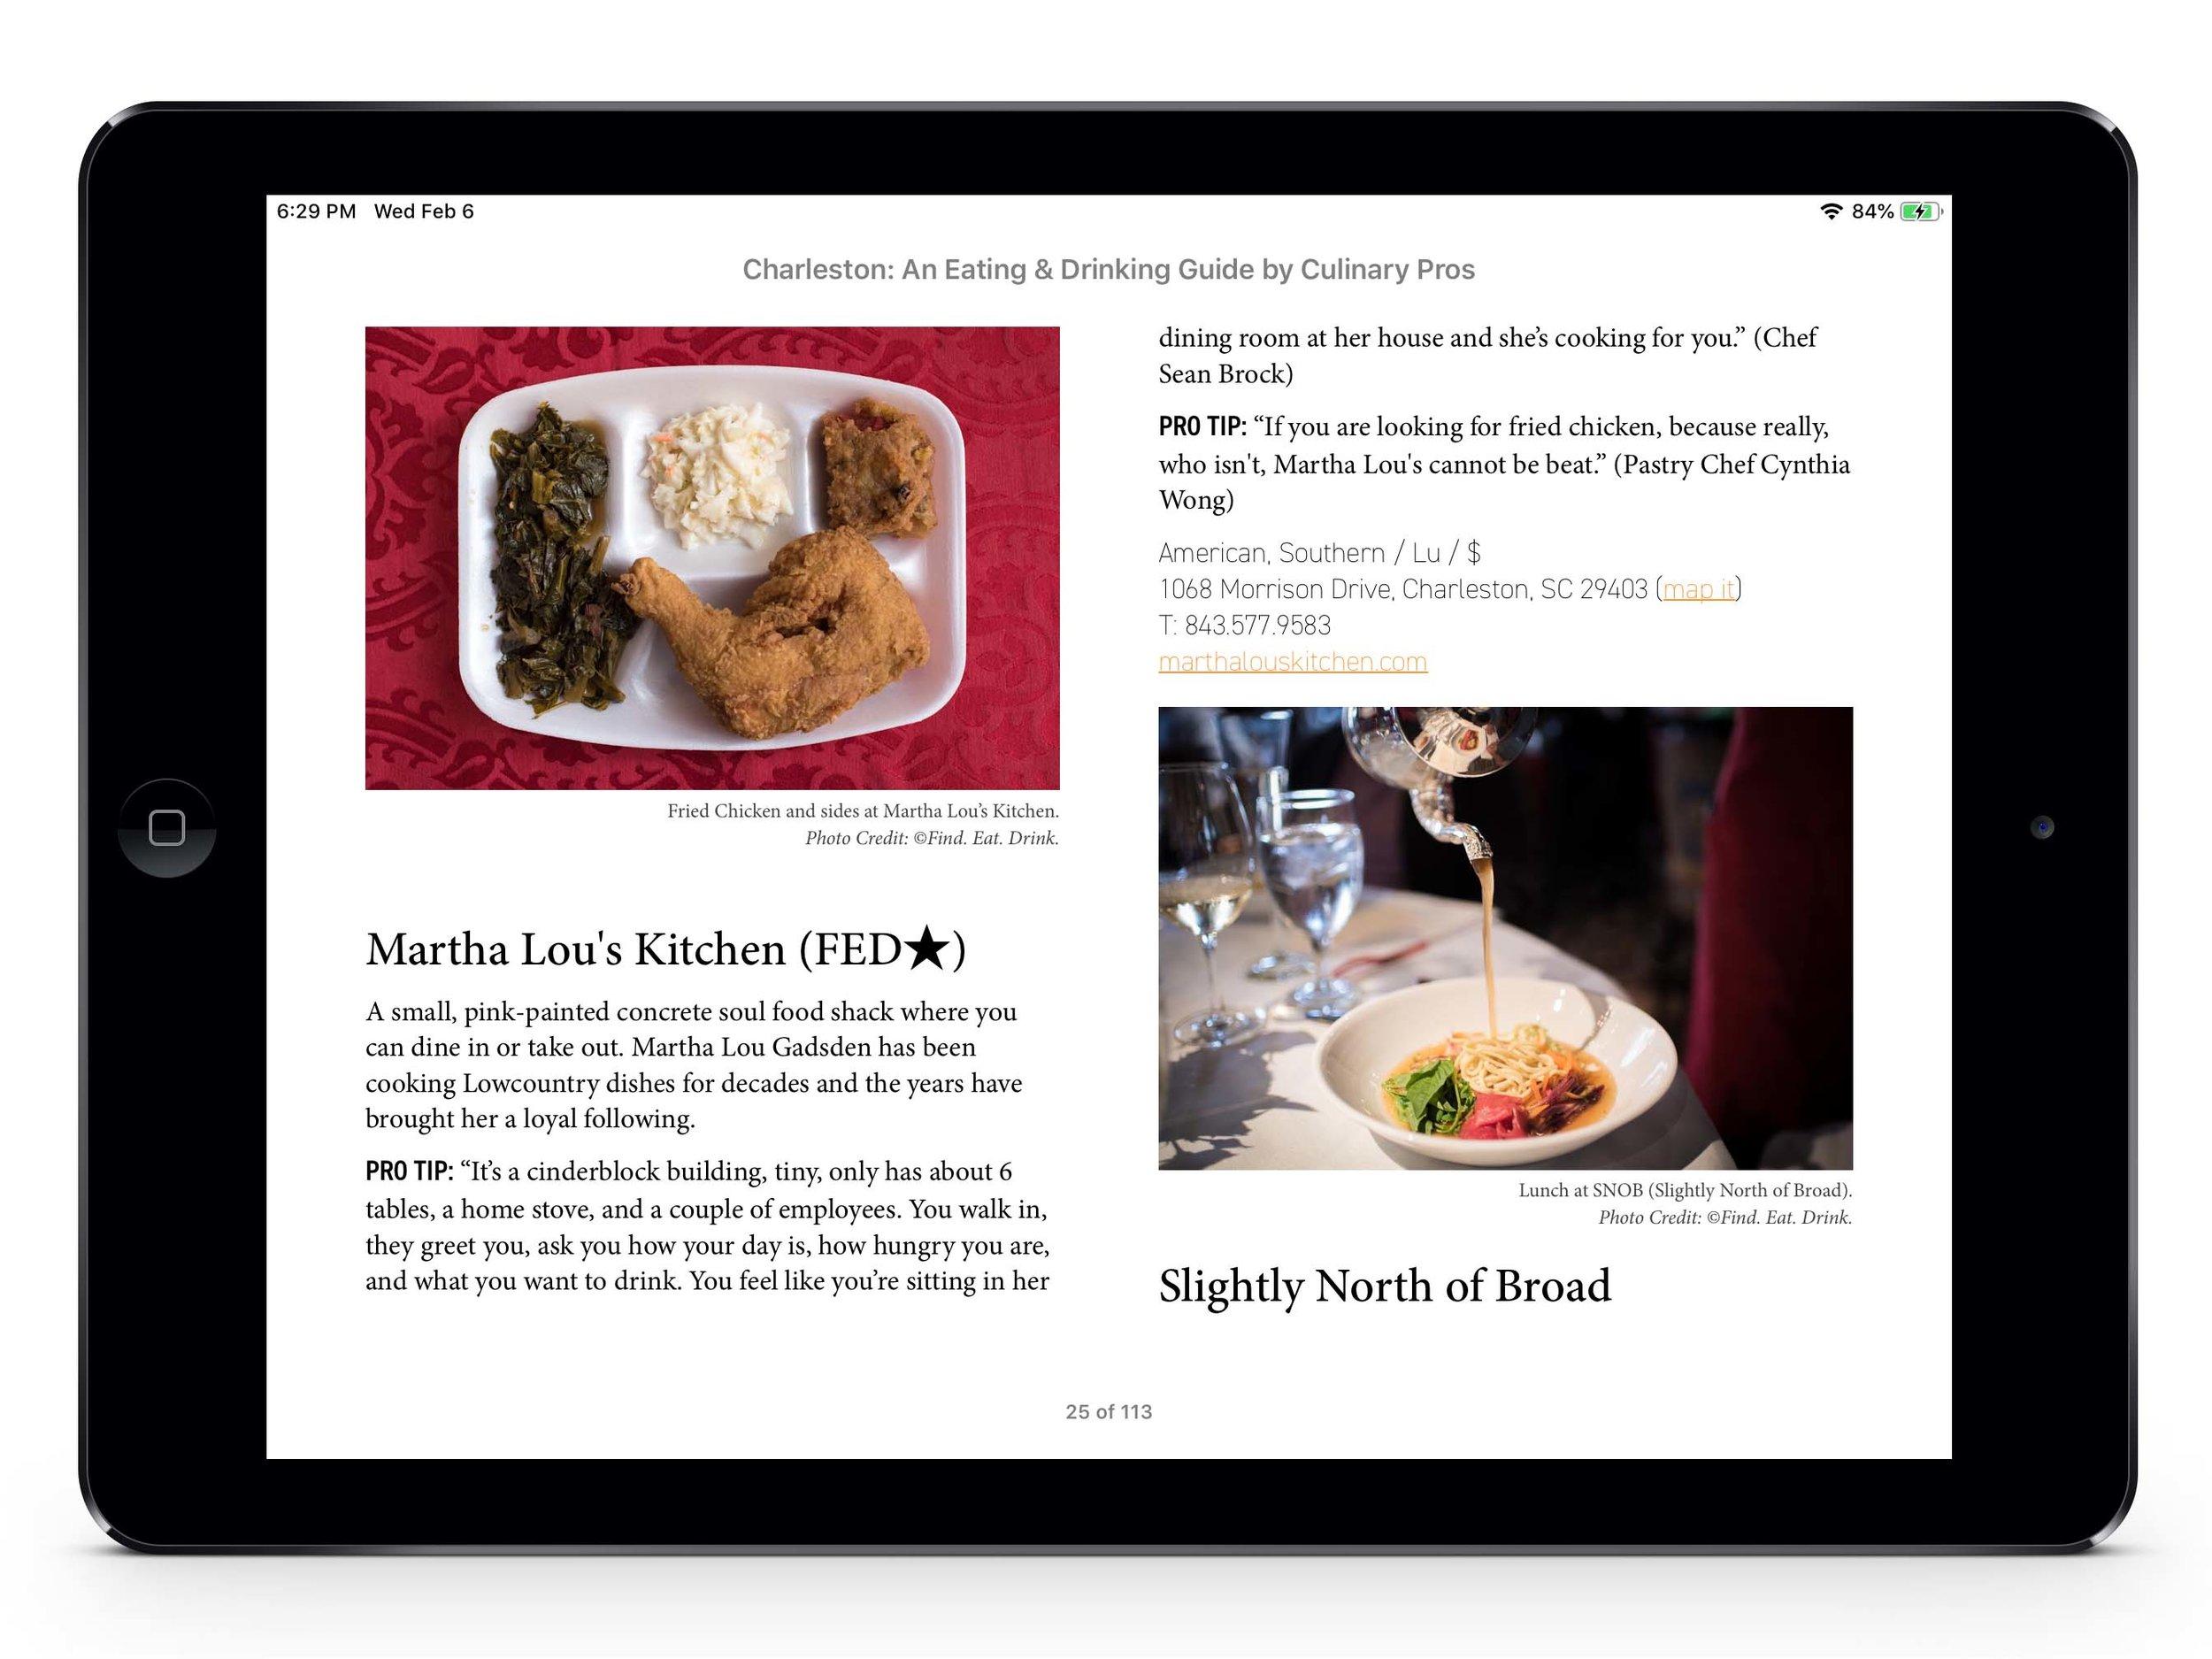 iPadAir_Charleston_Screenshots_Landscape_1.7_med.jpg